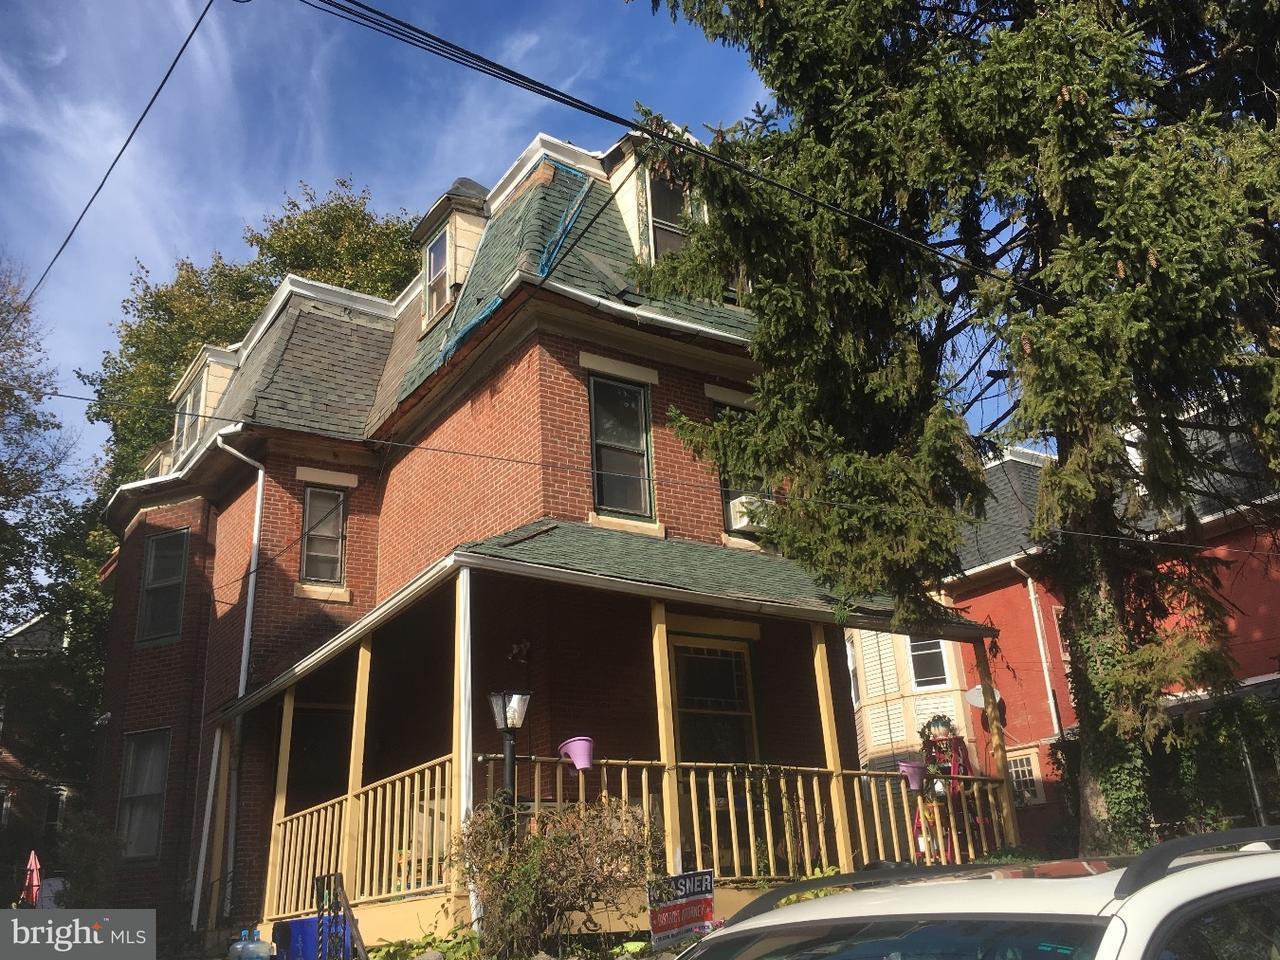 307 W Earlham Philadelphia , PA 19144